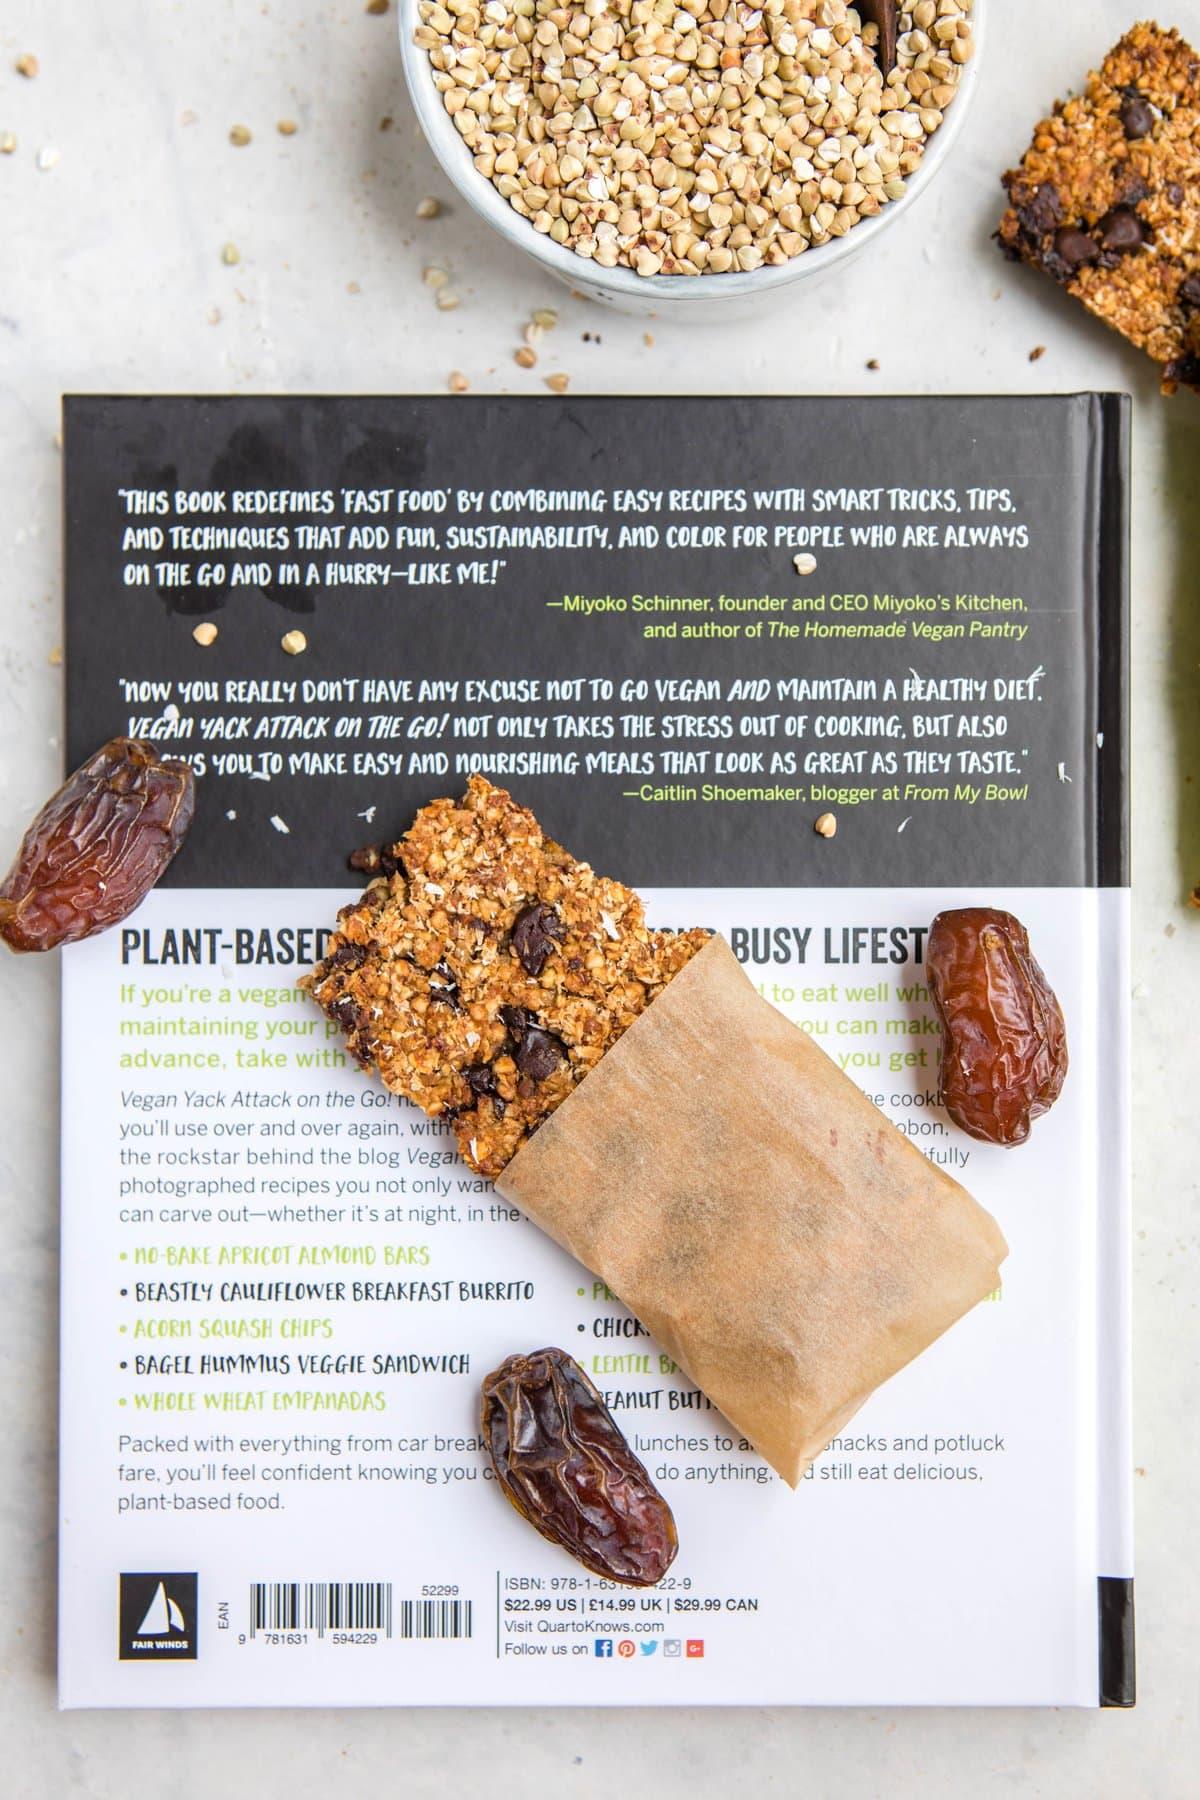 vanilla chip buckwheat bar on top of vegan yack attack on the go book